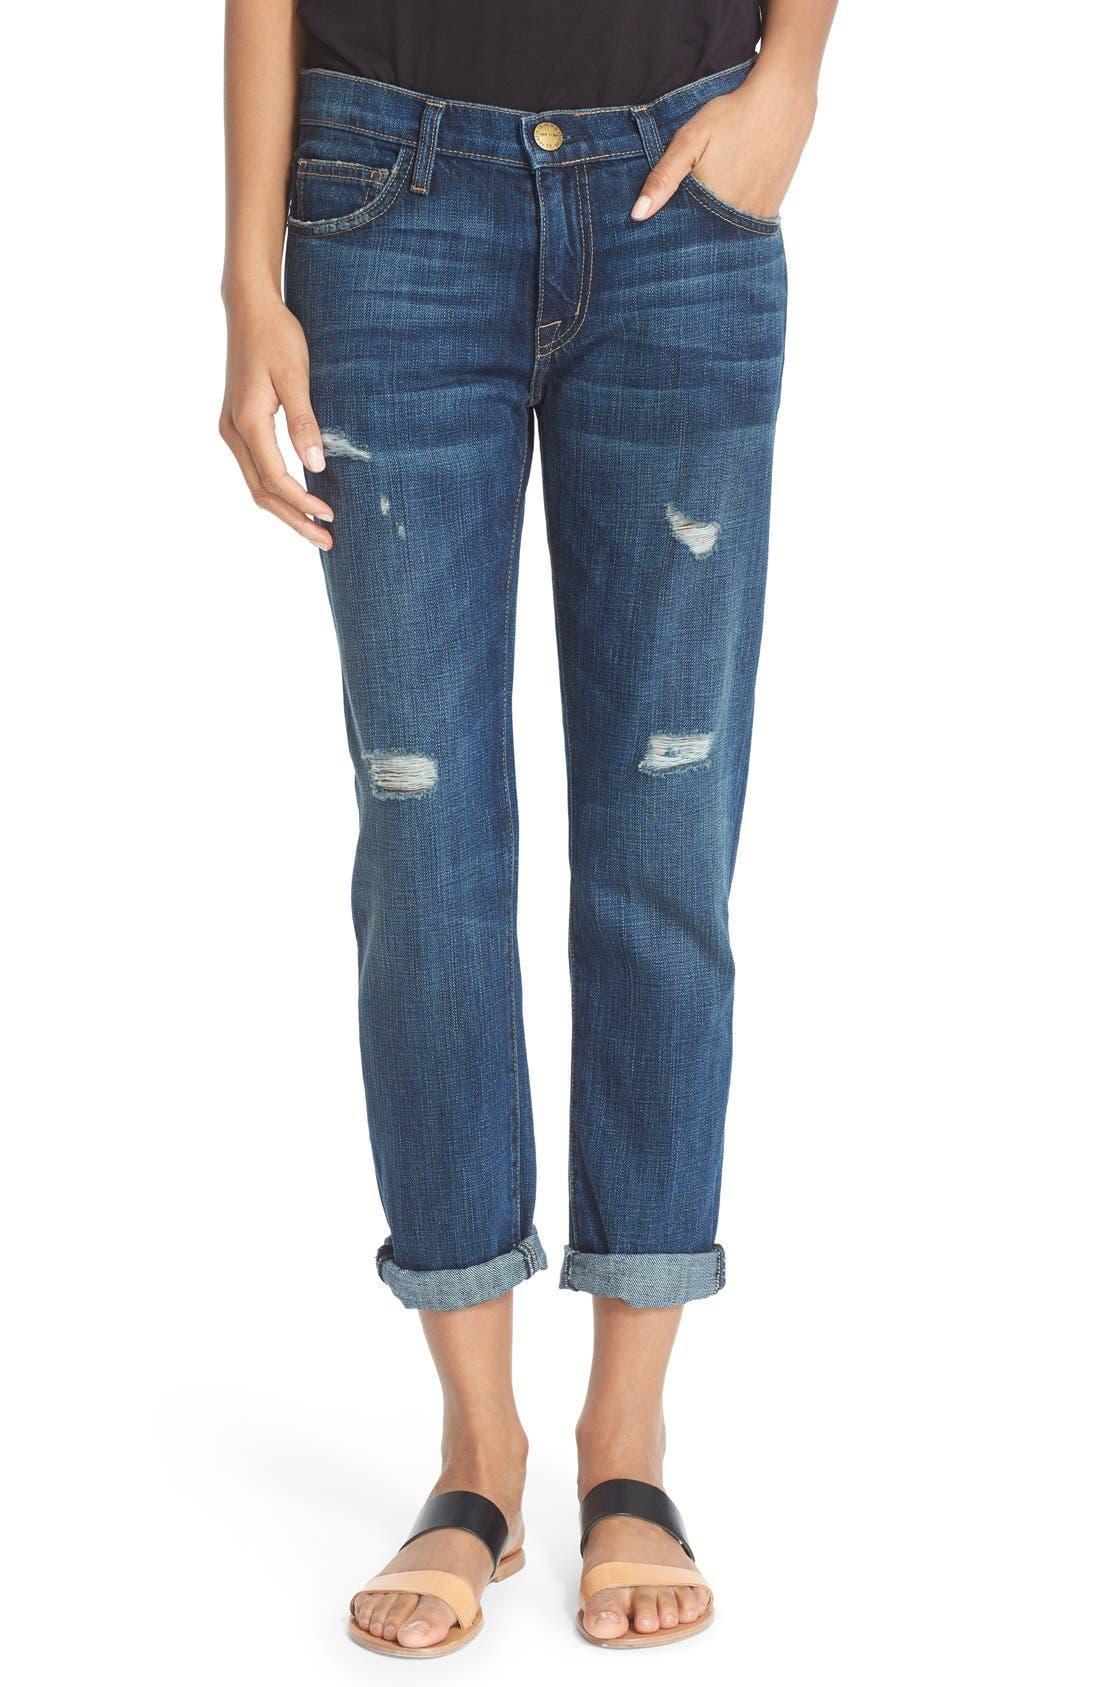 'The Fling' Boyfriend Jeans,                         Main,                         color, Loved Destroy